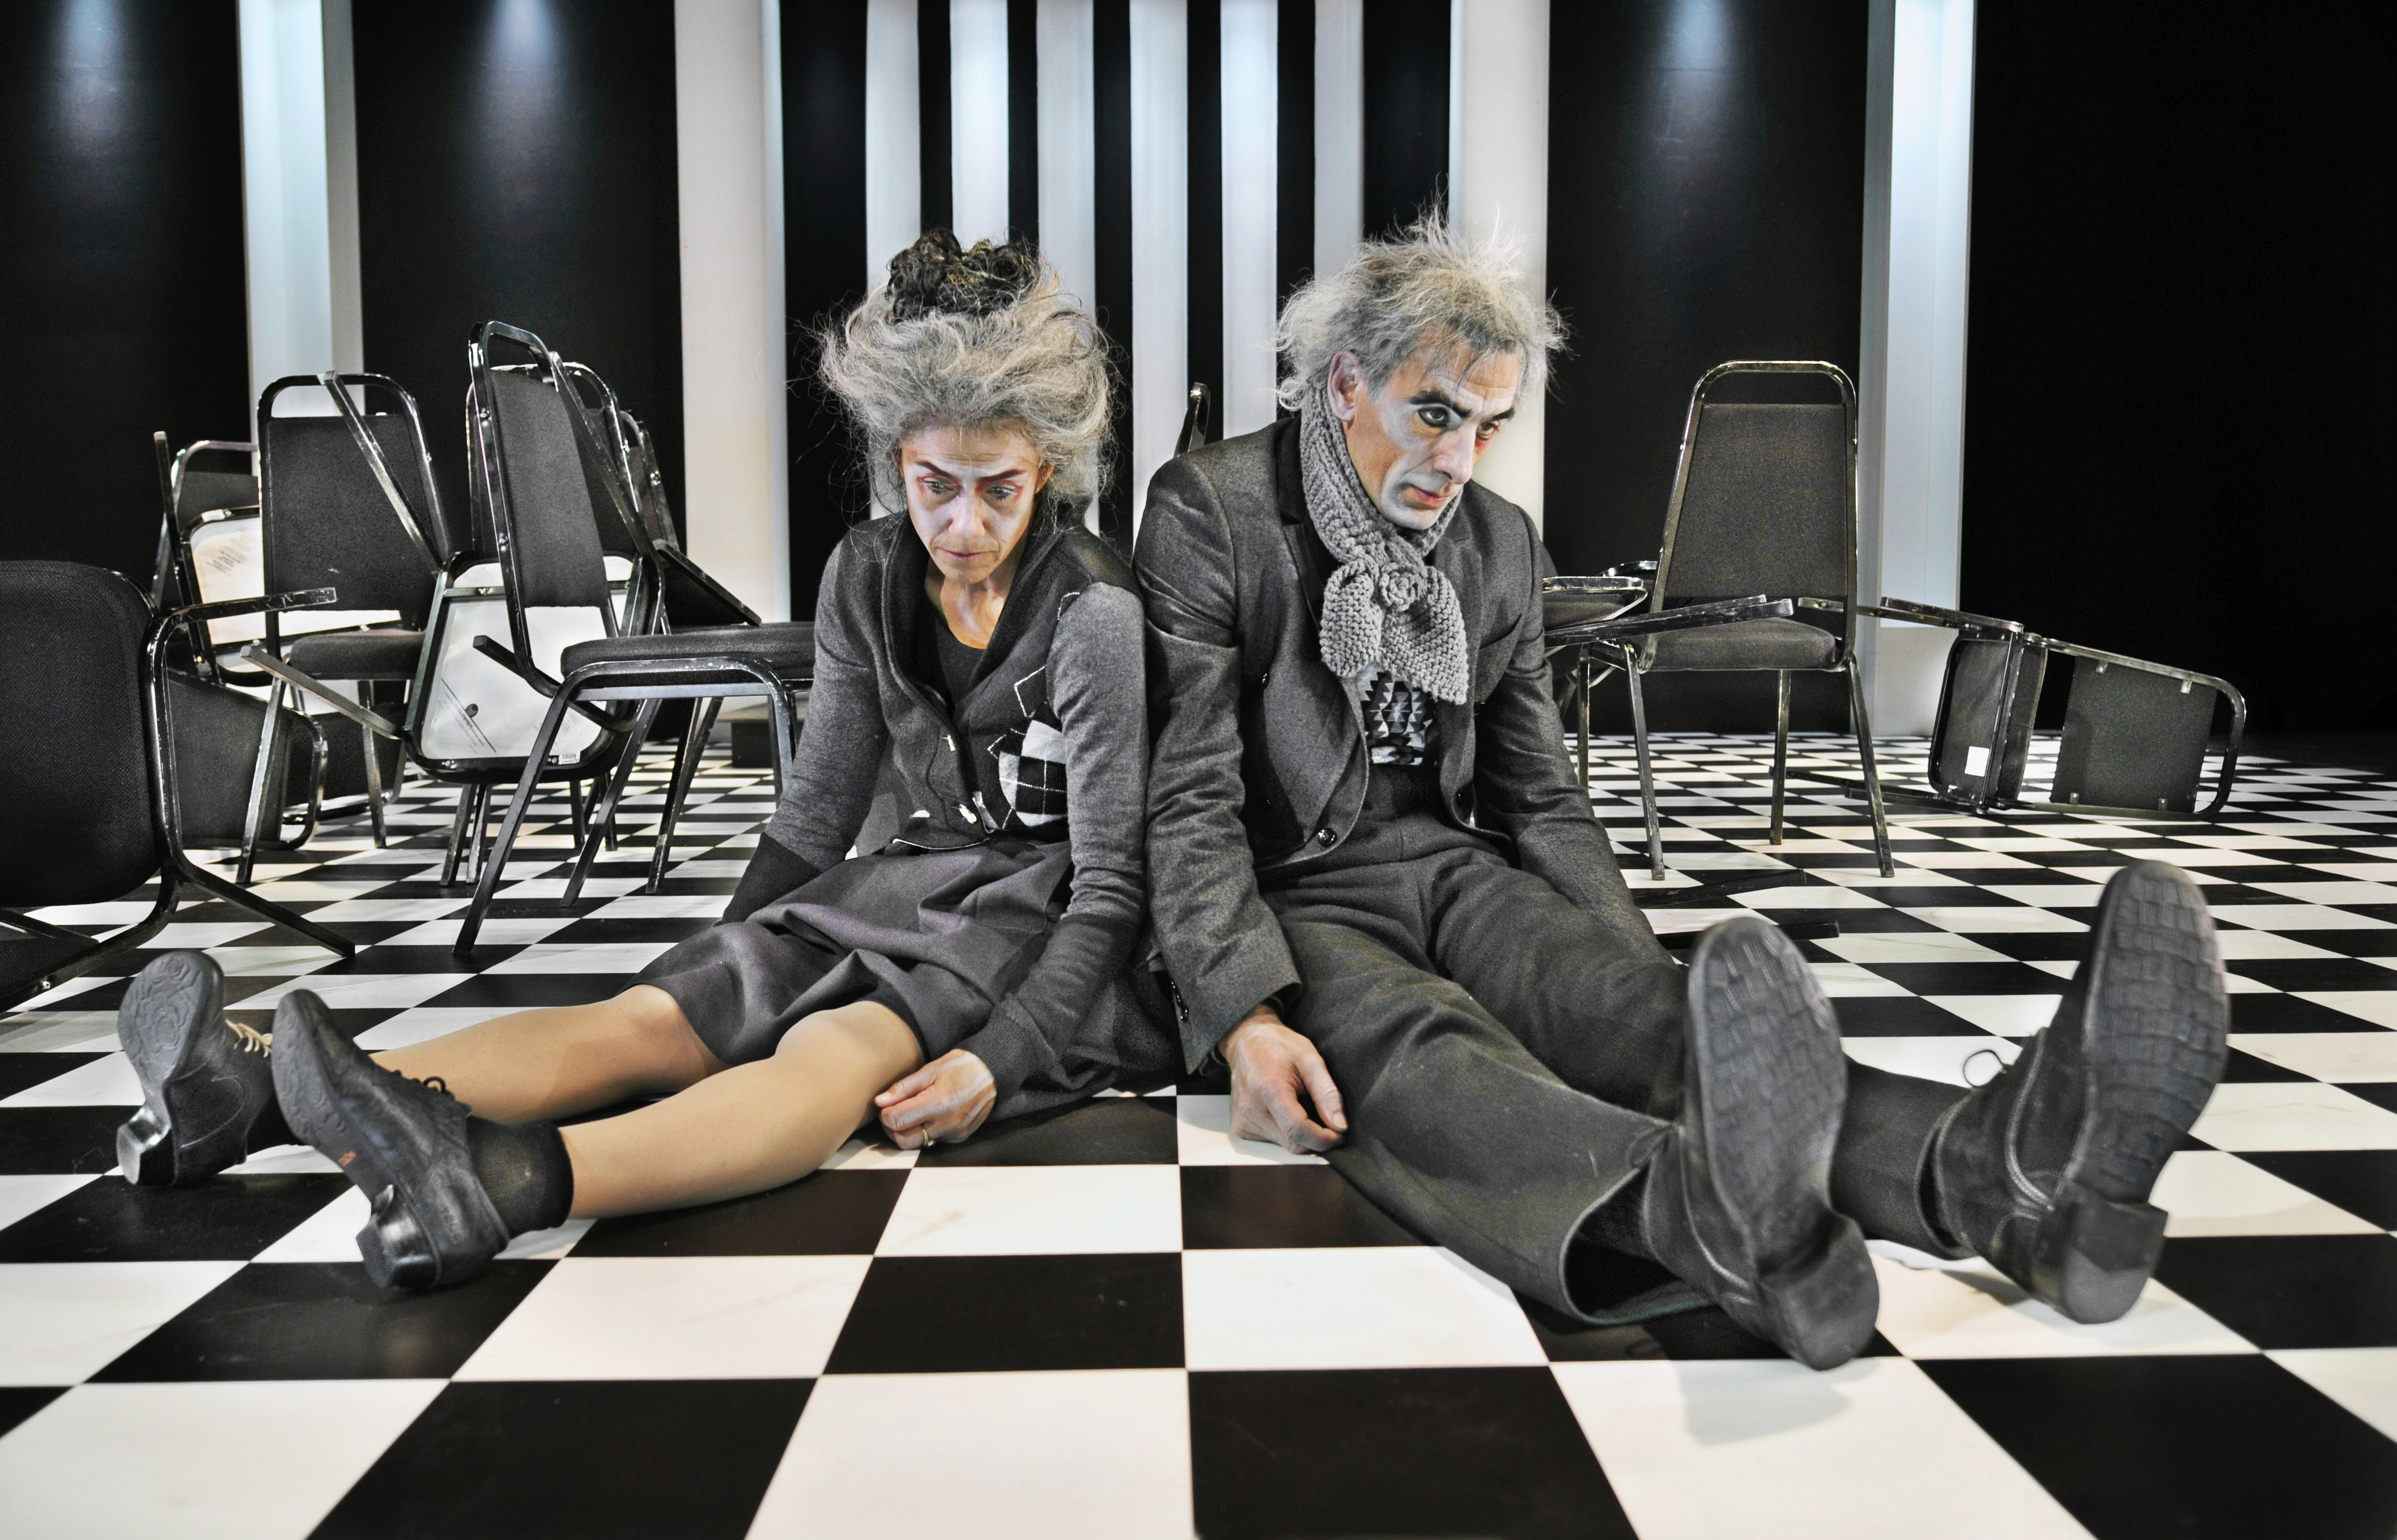 Credit-Rolline-Laporte